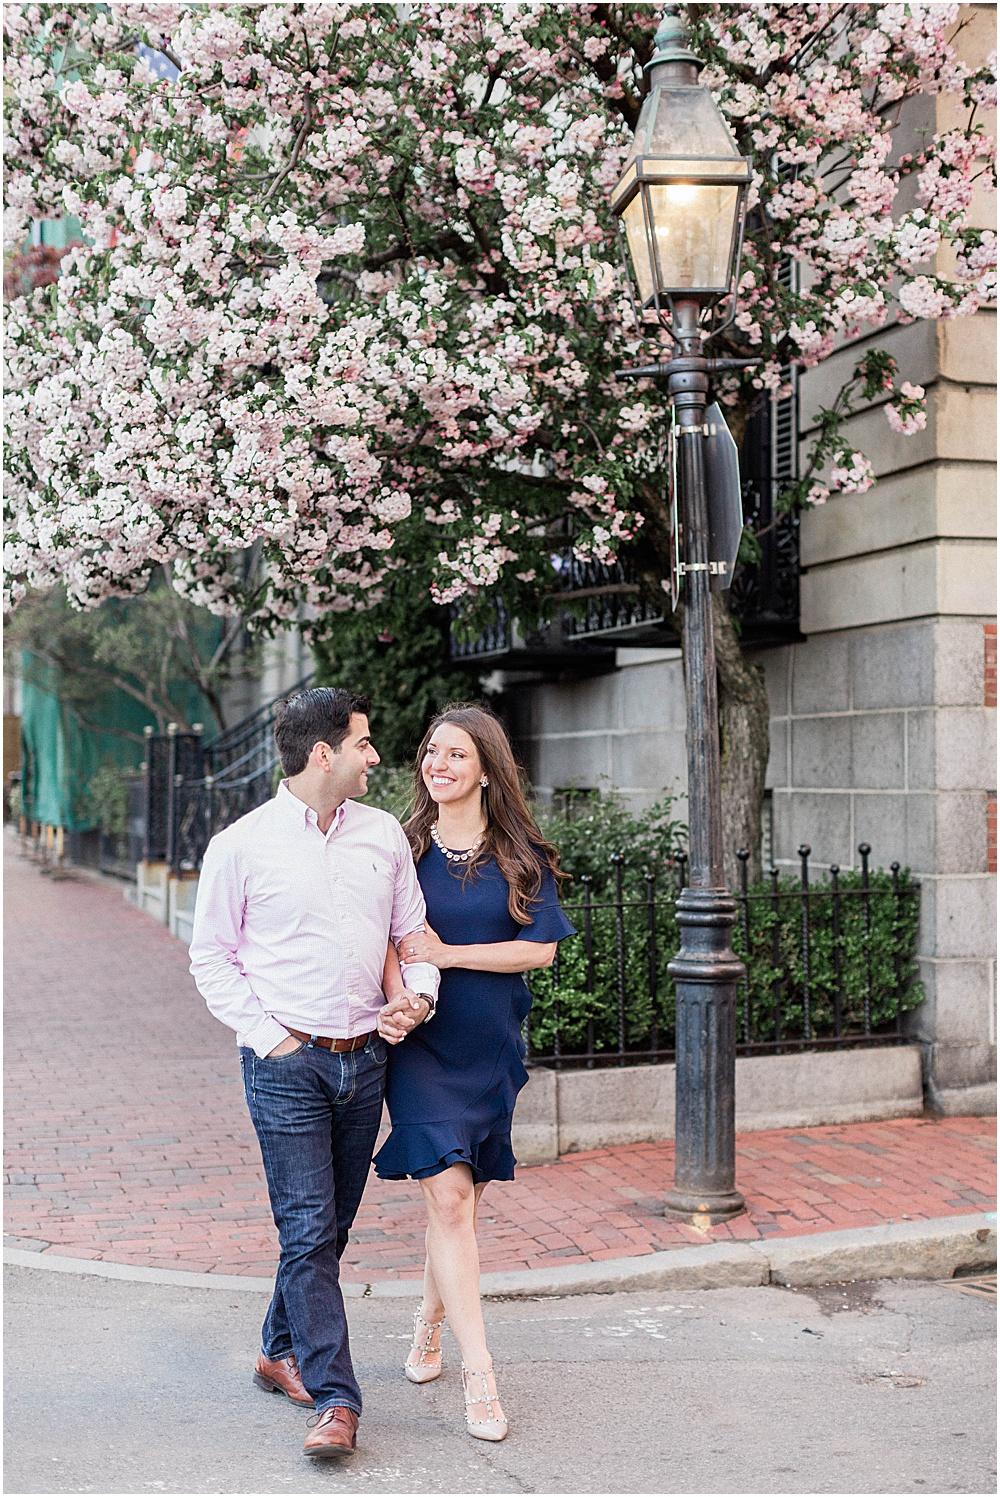 boston_common_cherry_blossoms_spring_engagement_session_boston_wedding_photographer_meredith_jane_photography_photo_0176.jpg